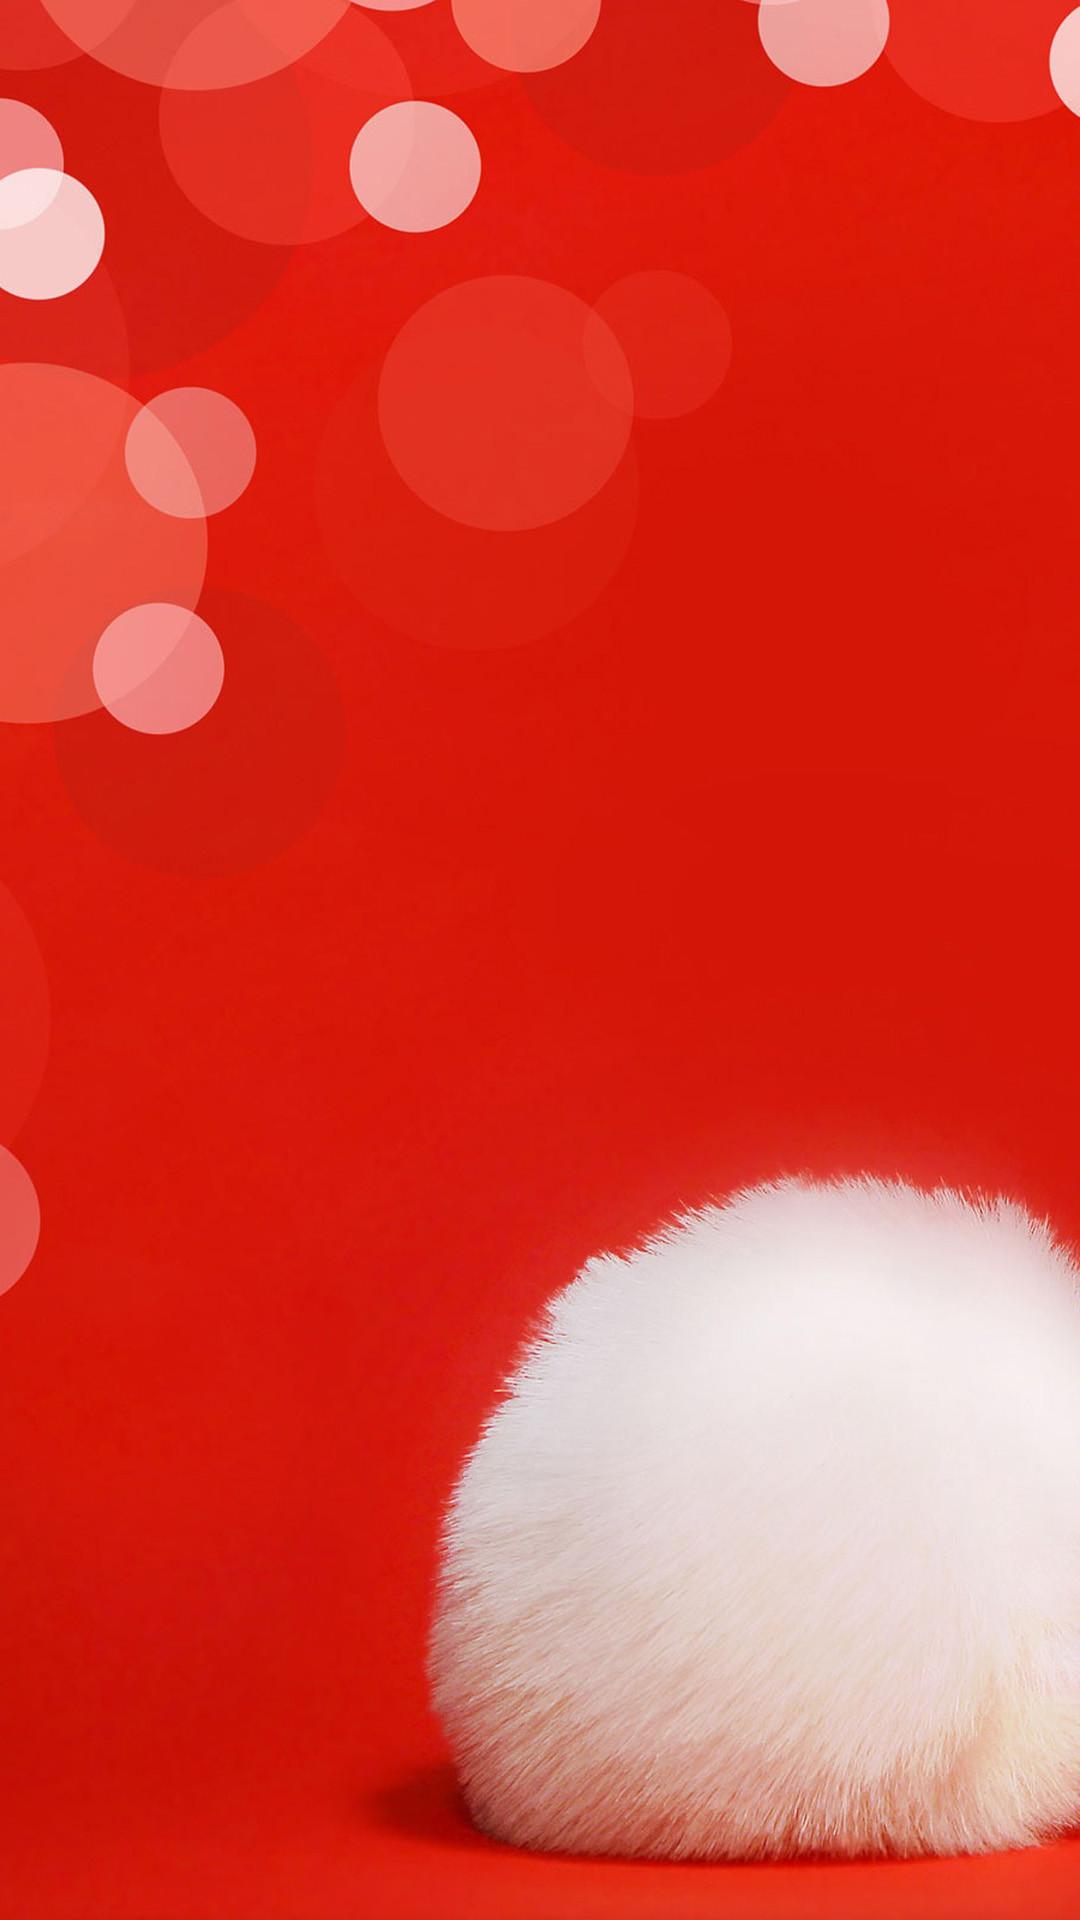 Christmas theme background HD samsung galaxy s4 wallpaper 1080x1920